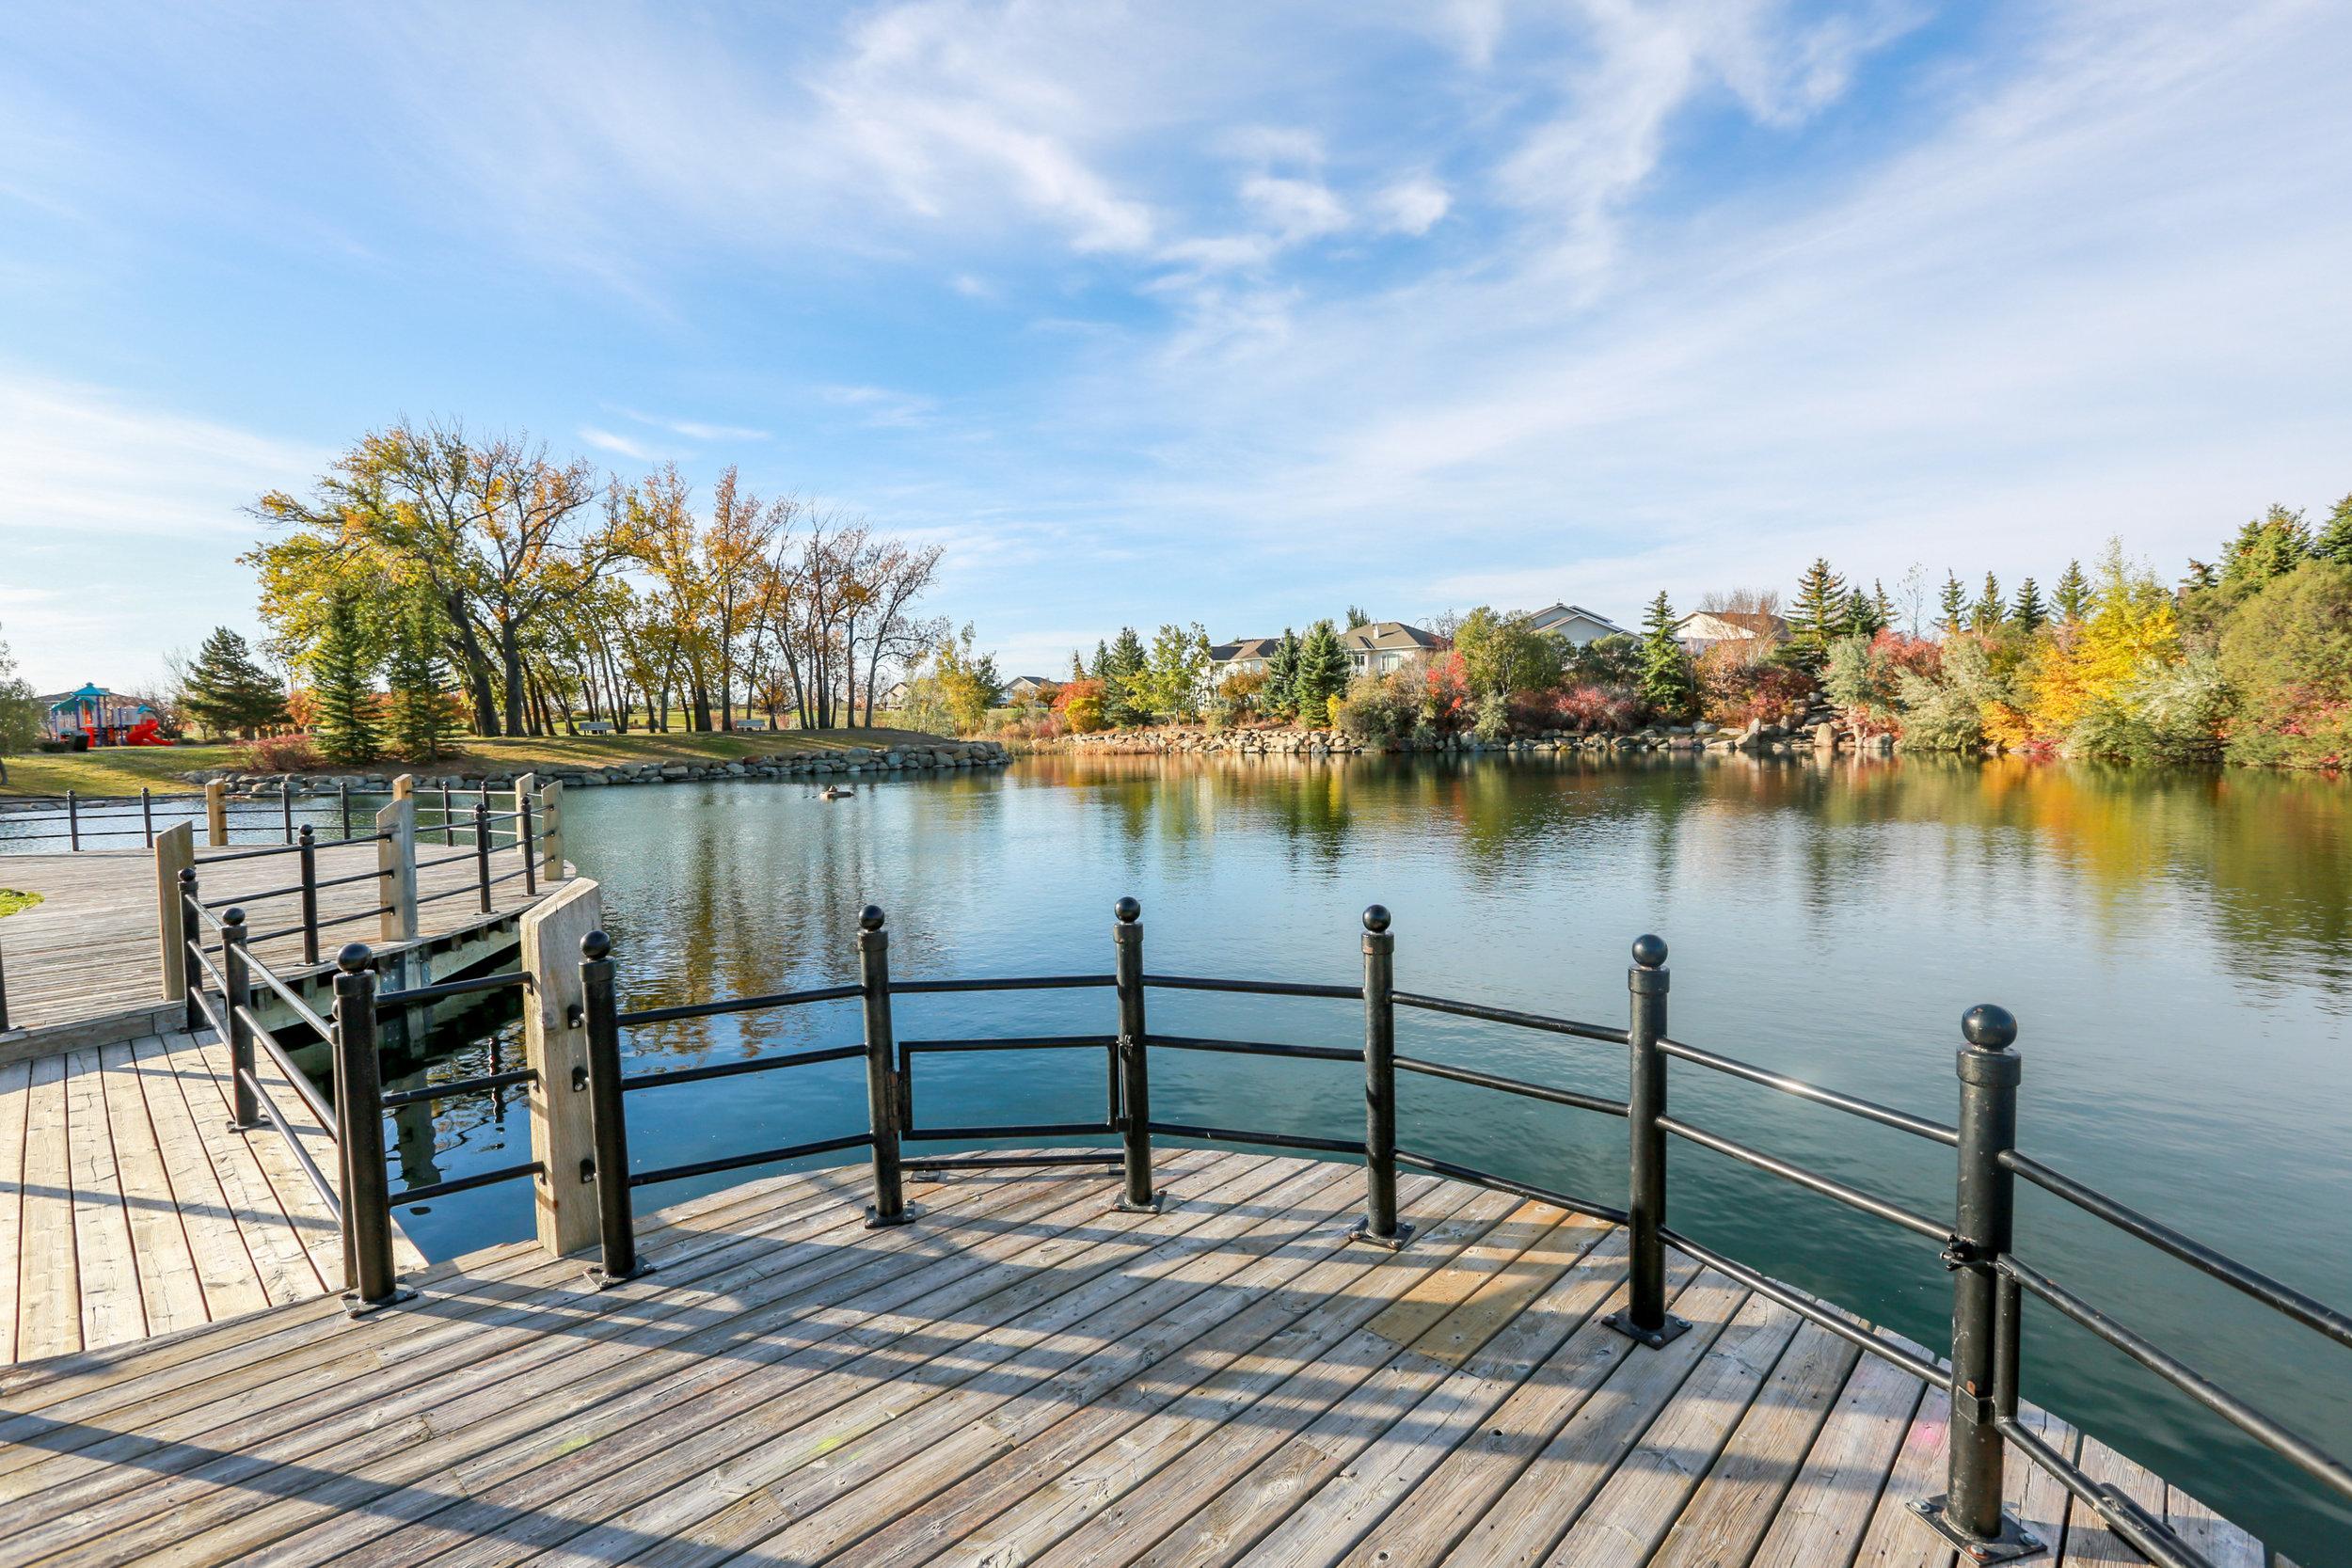 riverstone pond. (1 of 1)-4.jpg